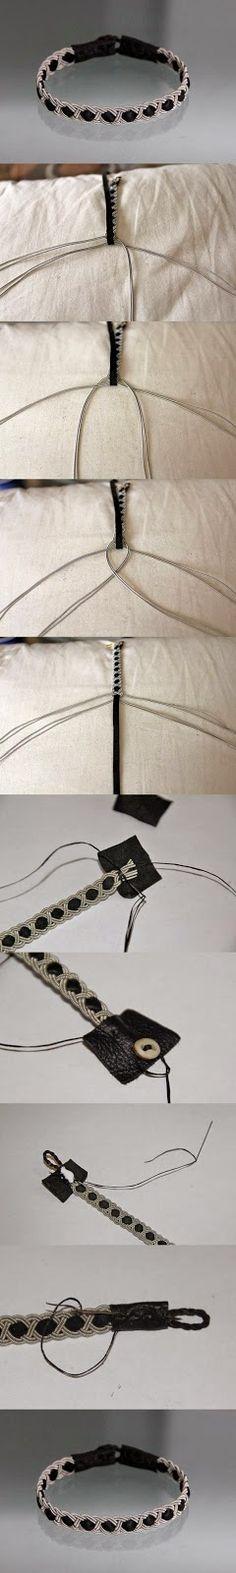 Amazing Do it Yourself ideas: DIY Cute Bracelet